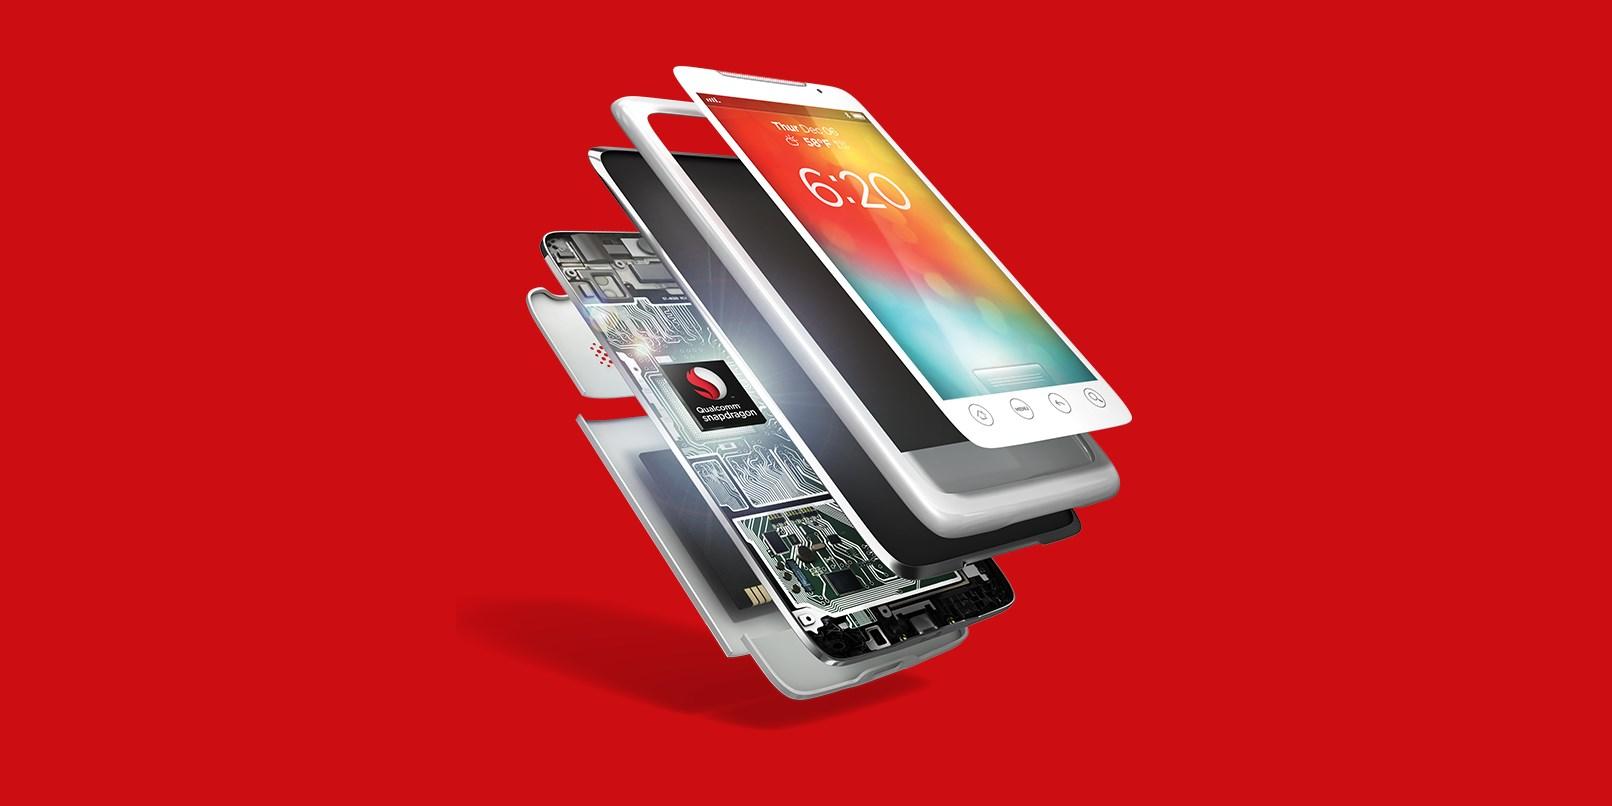 Qualcomm Snapdragon 835 Vs MediaTek Helio X30 & P35